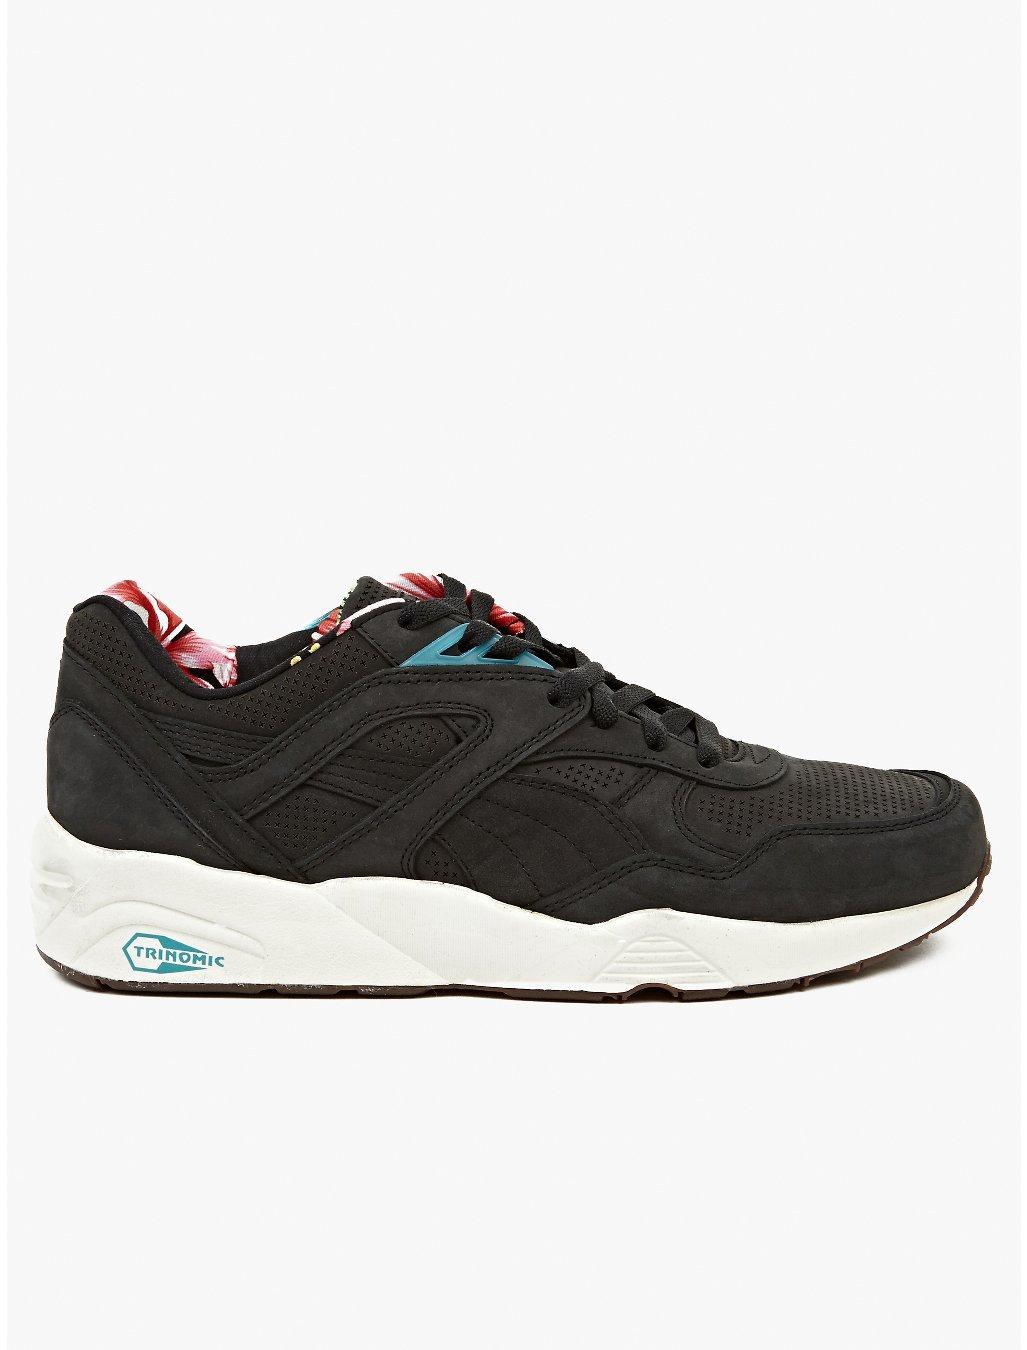 Puma Mens Trinomic R698l Tropicalia Sneakers In Black For